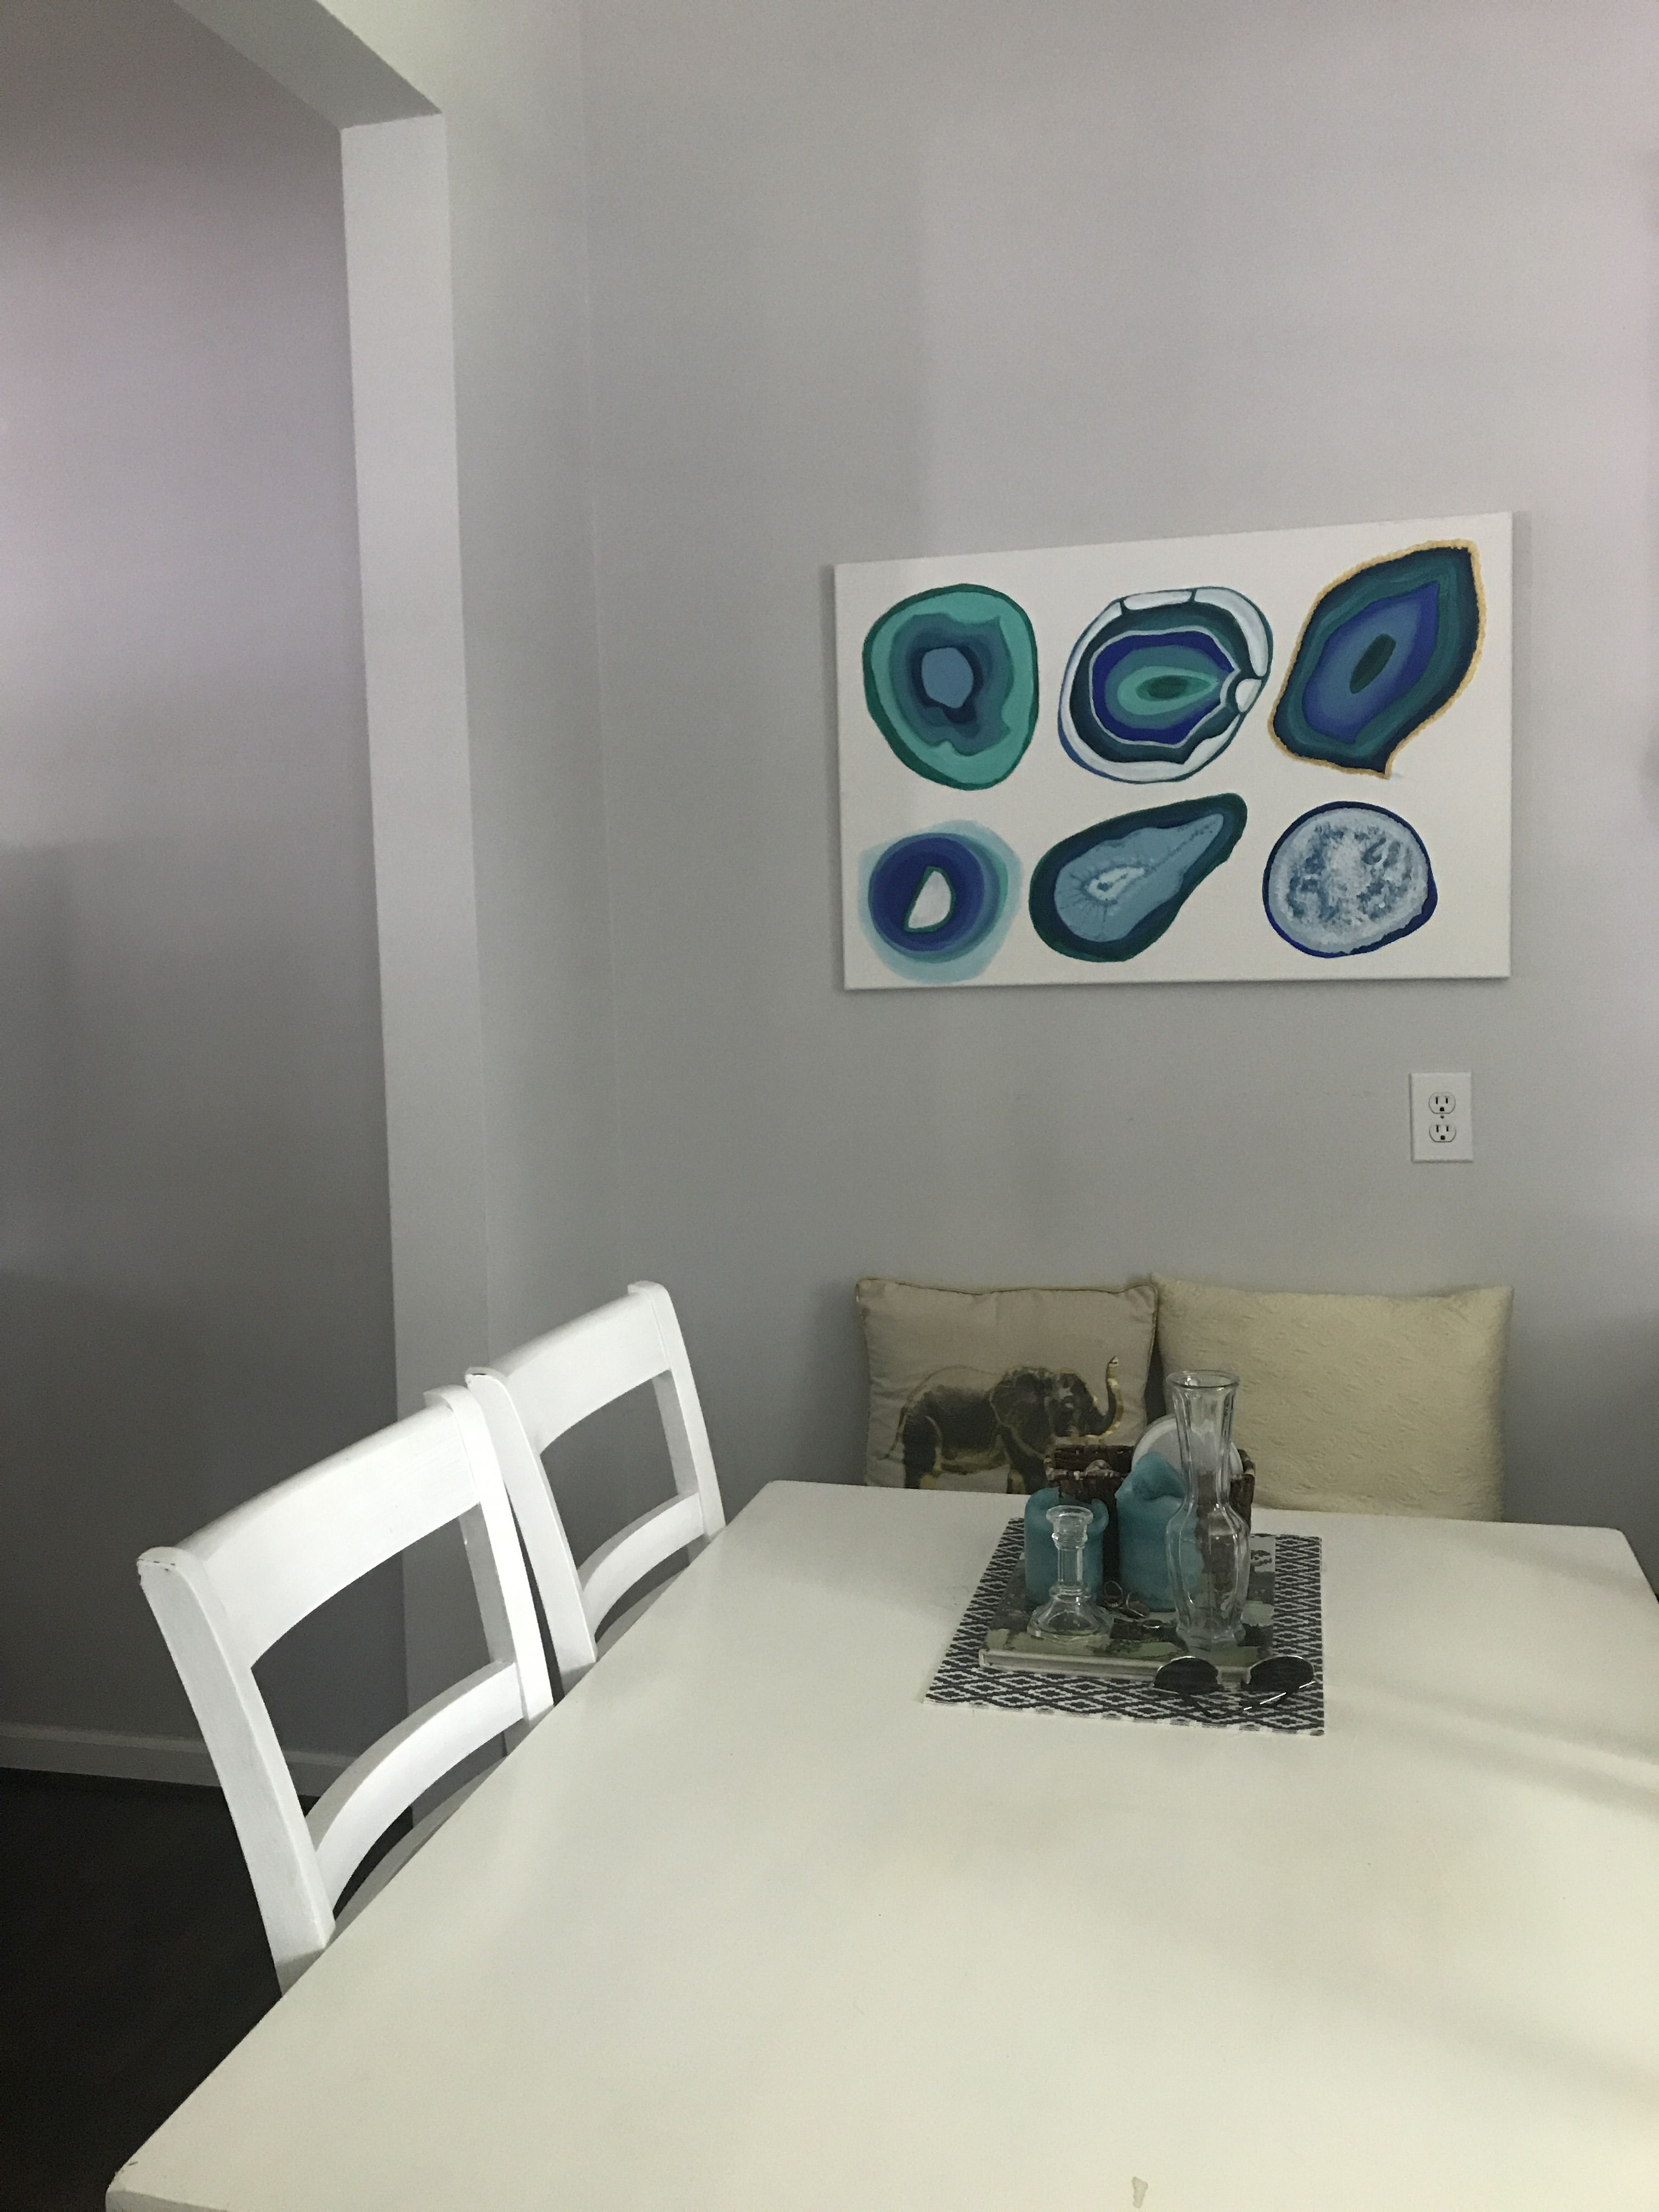 Geode Wall Art In Dining Nook (Painted By Katie Hawkins)